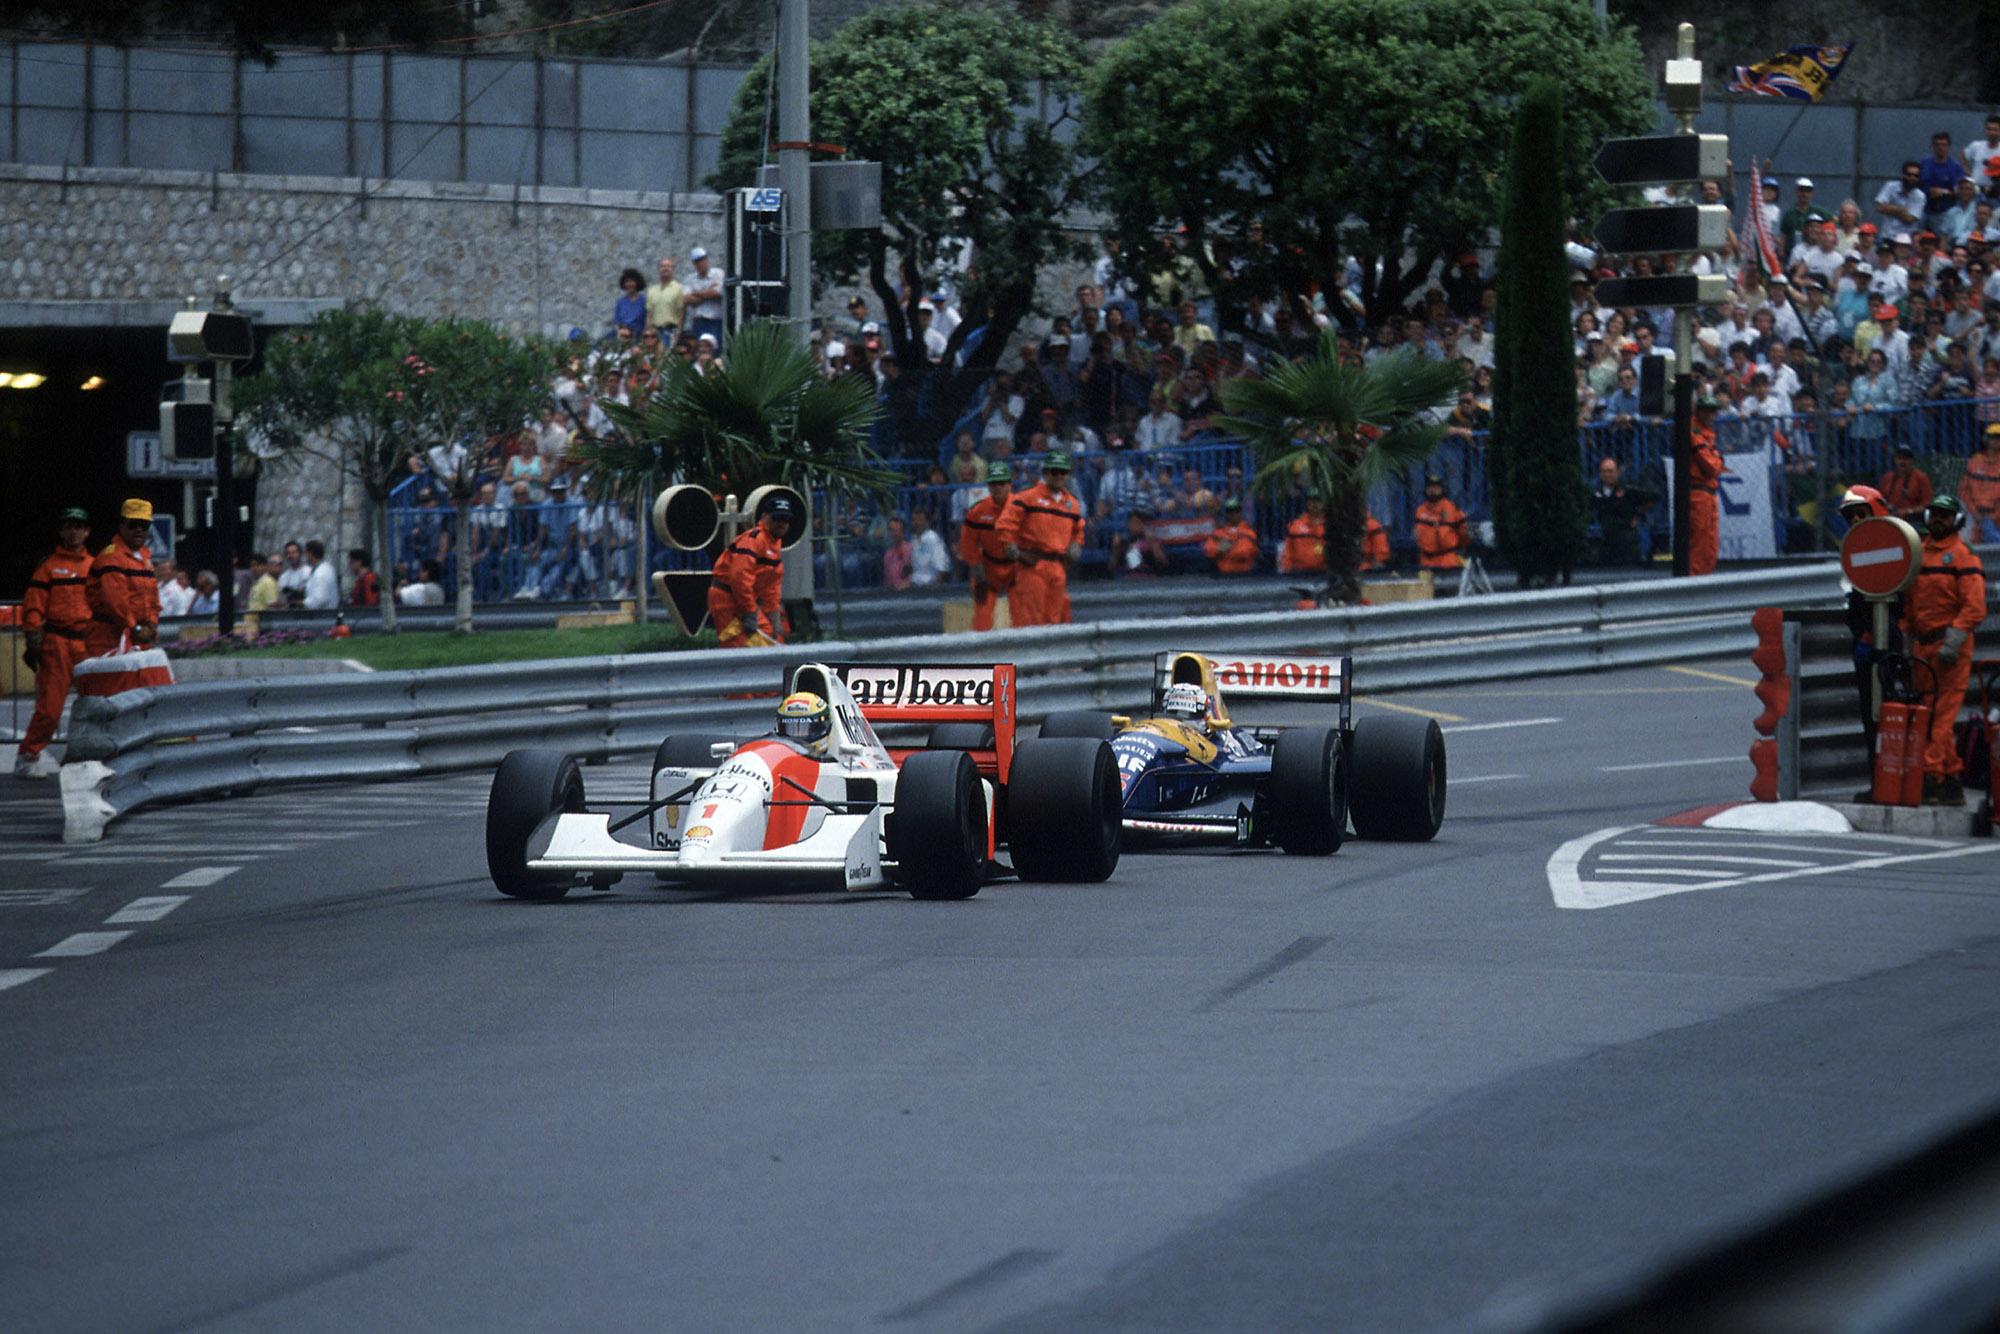 Ayrton Senna defends against Nigel Mansell at the 1992 Monaco Grand Prix